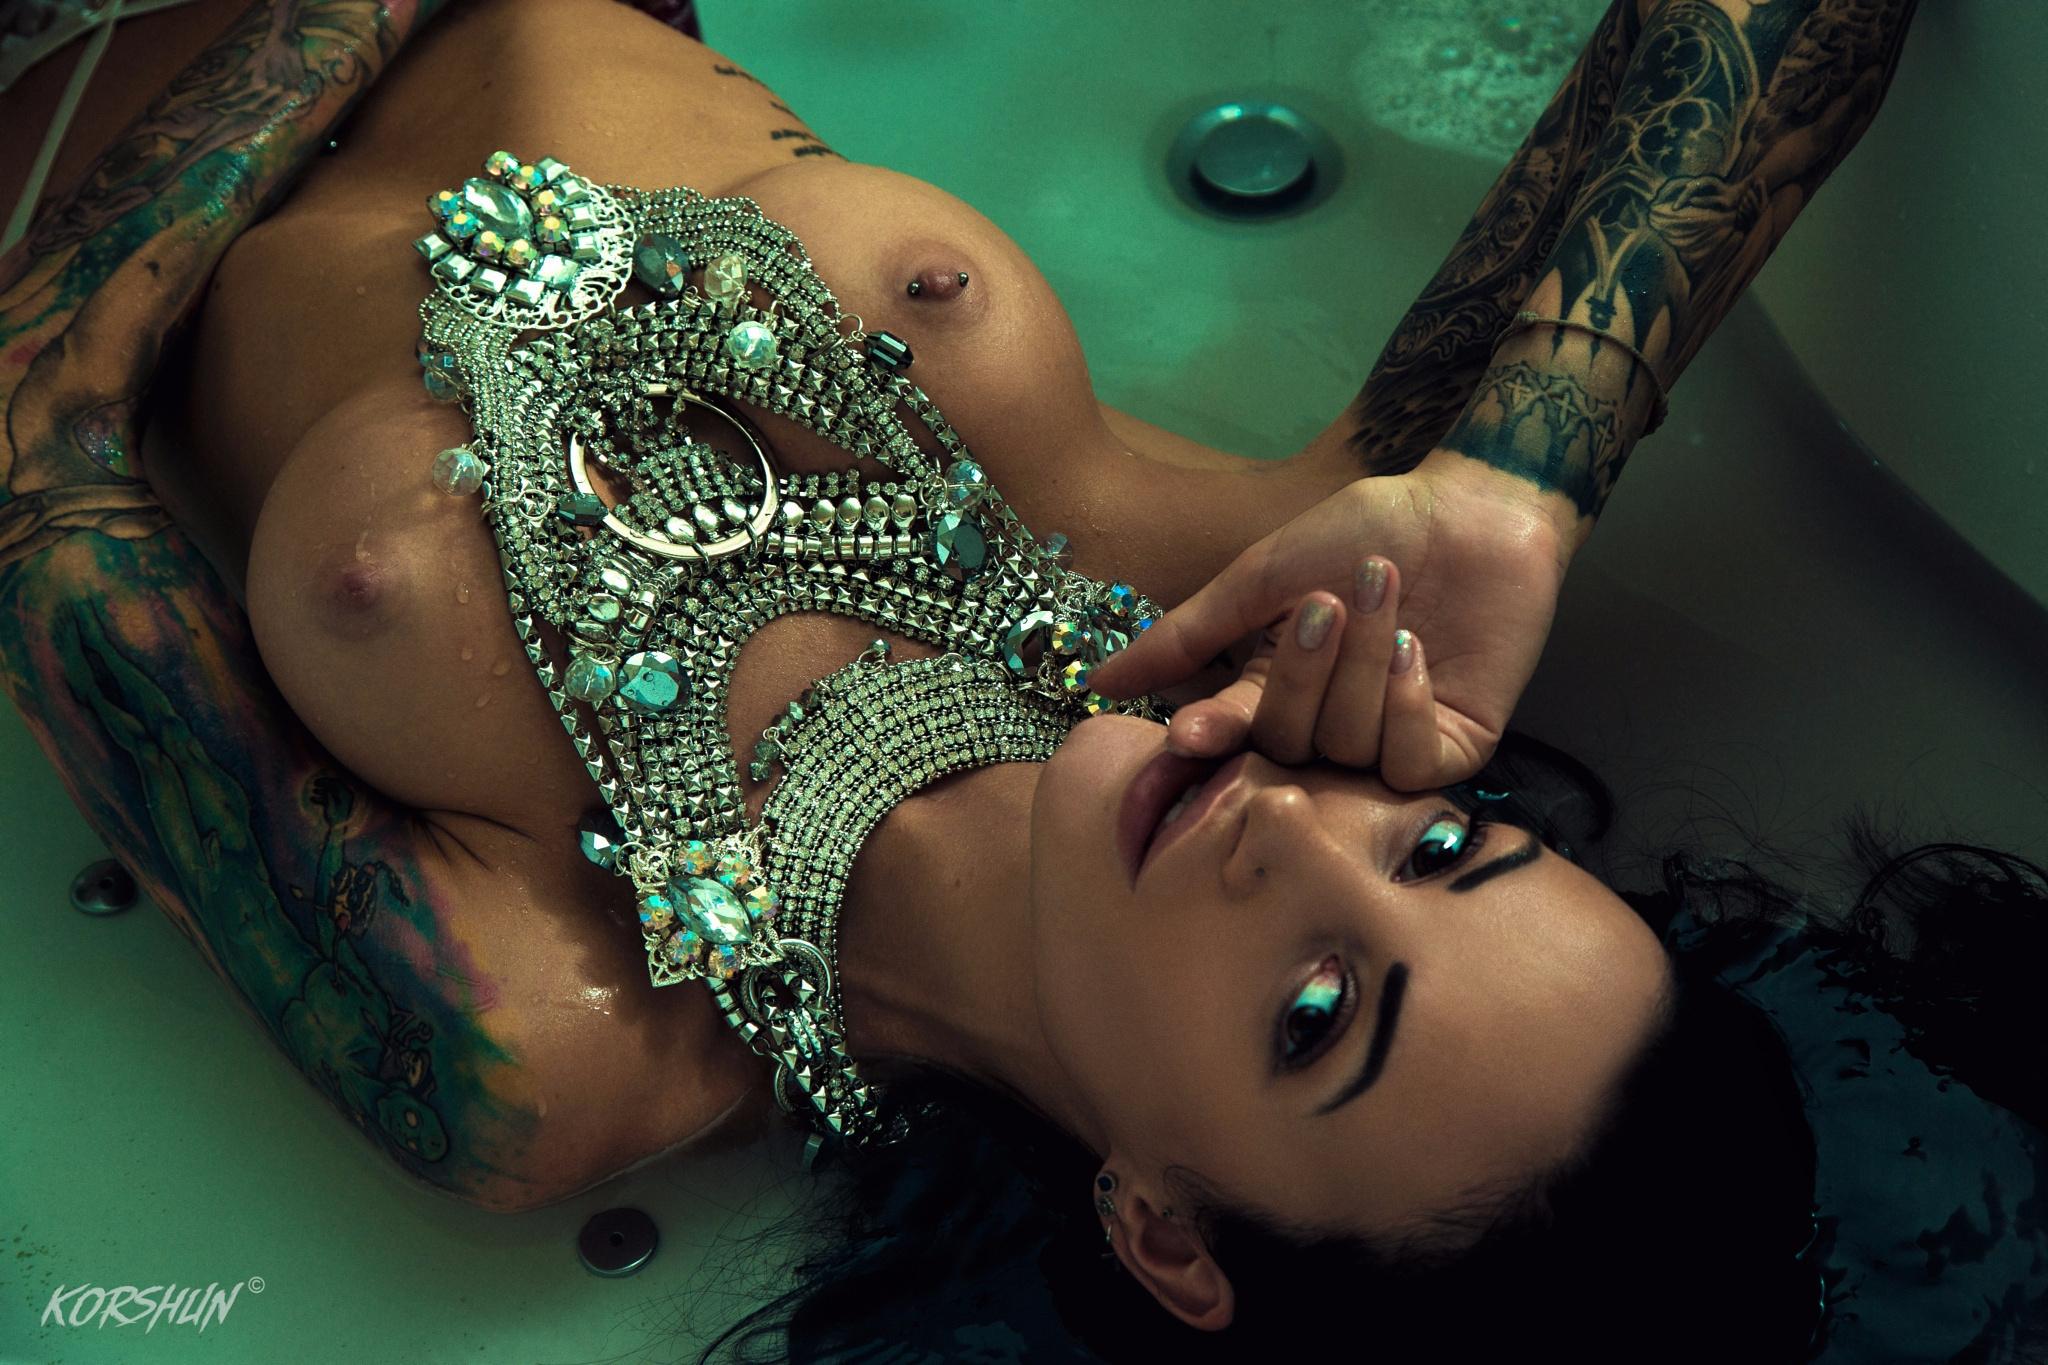 AlexKorshun, Woman, Beautifulwoman - anytimecrazysex | ello